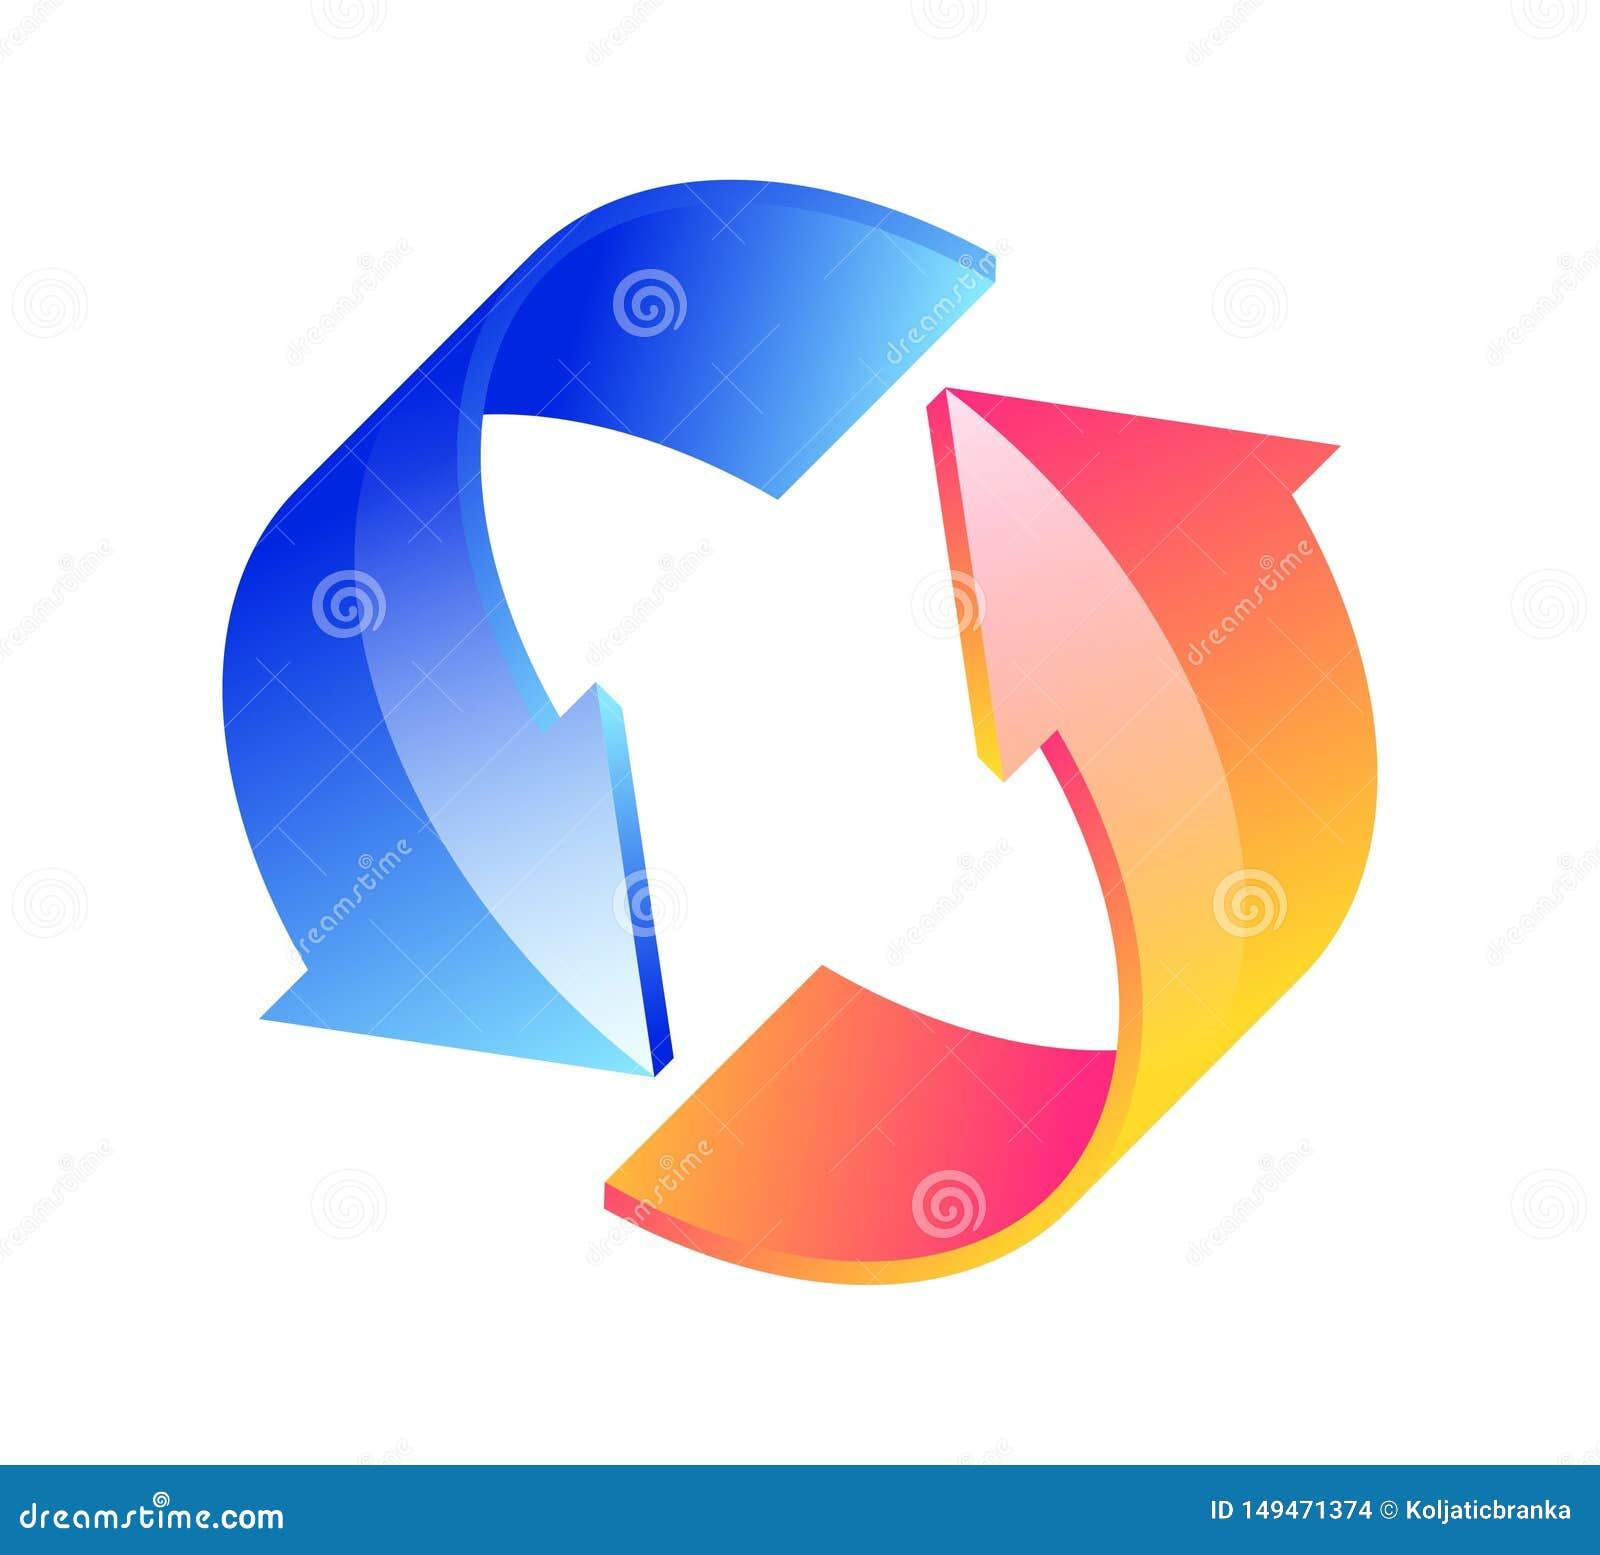 Flechas circulares 3D en un fondo blanco